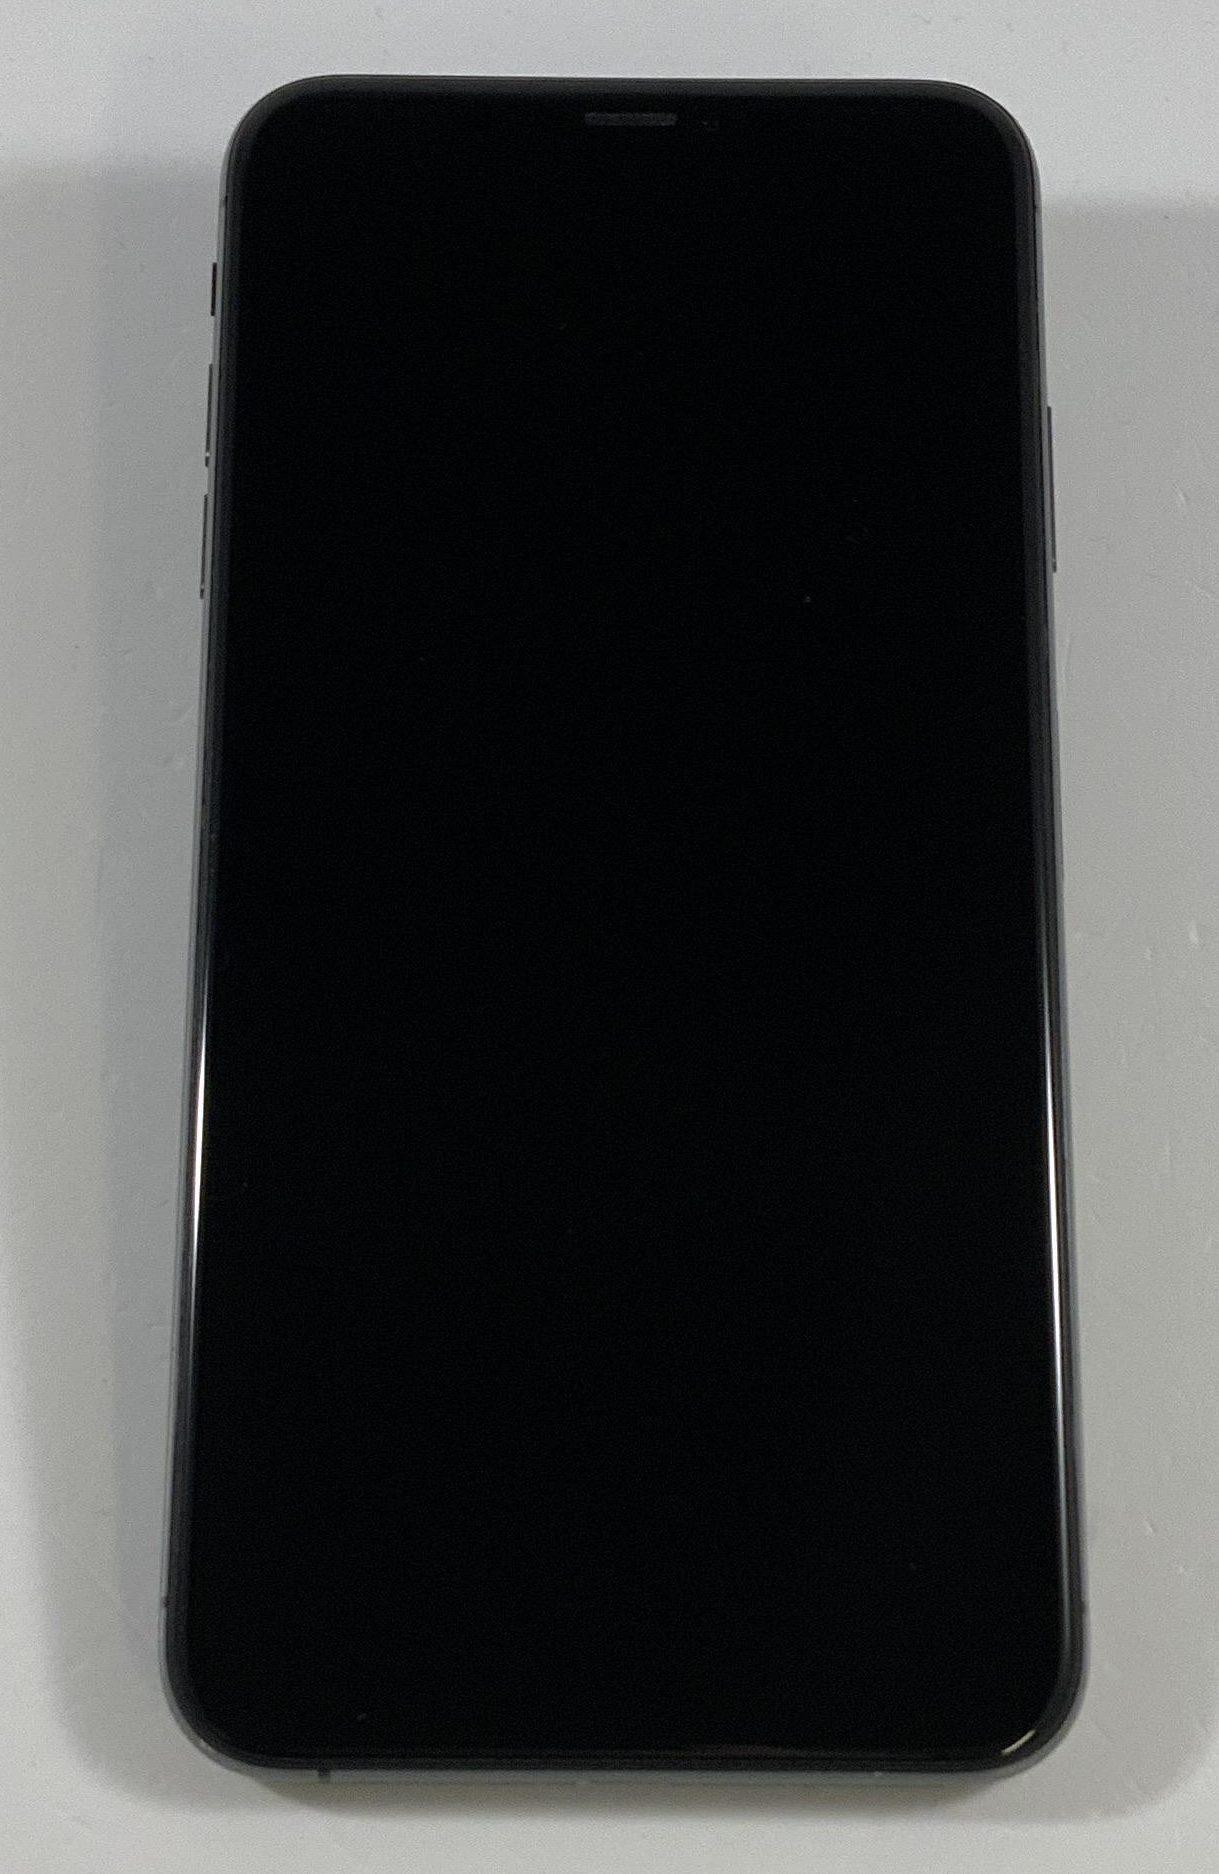 iPhone XS Max 64GB, 64GB, Space Gray, immagine 1